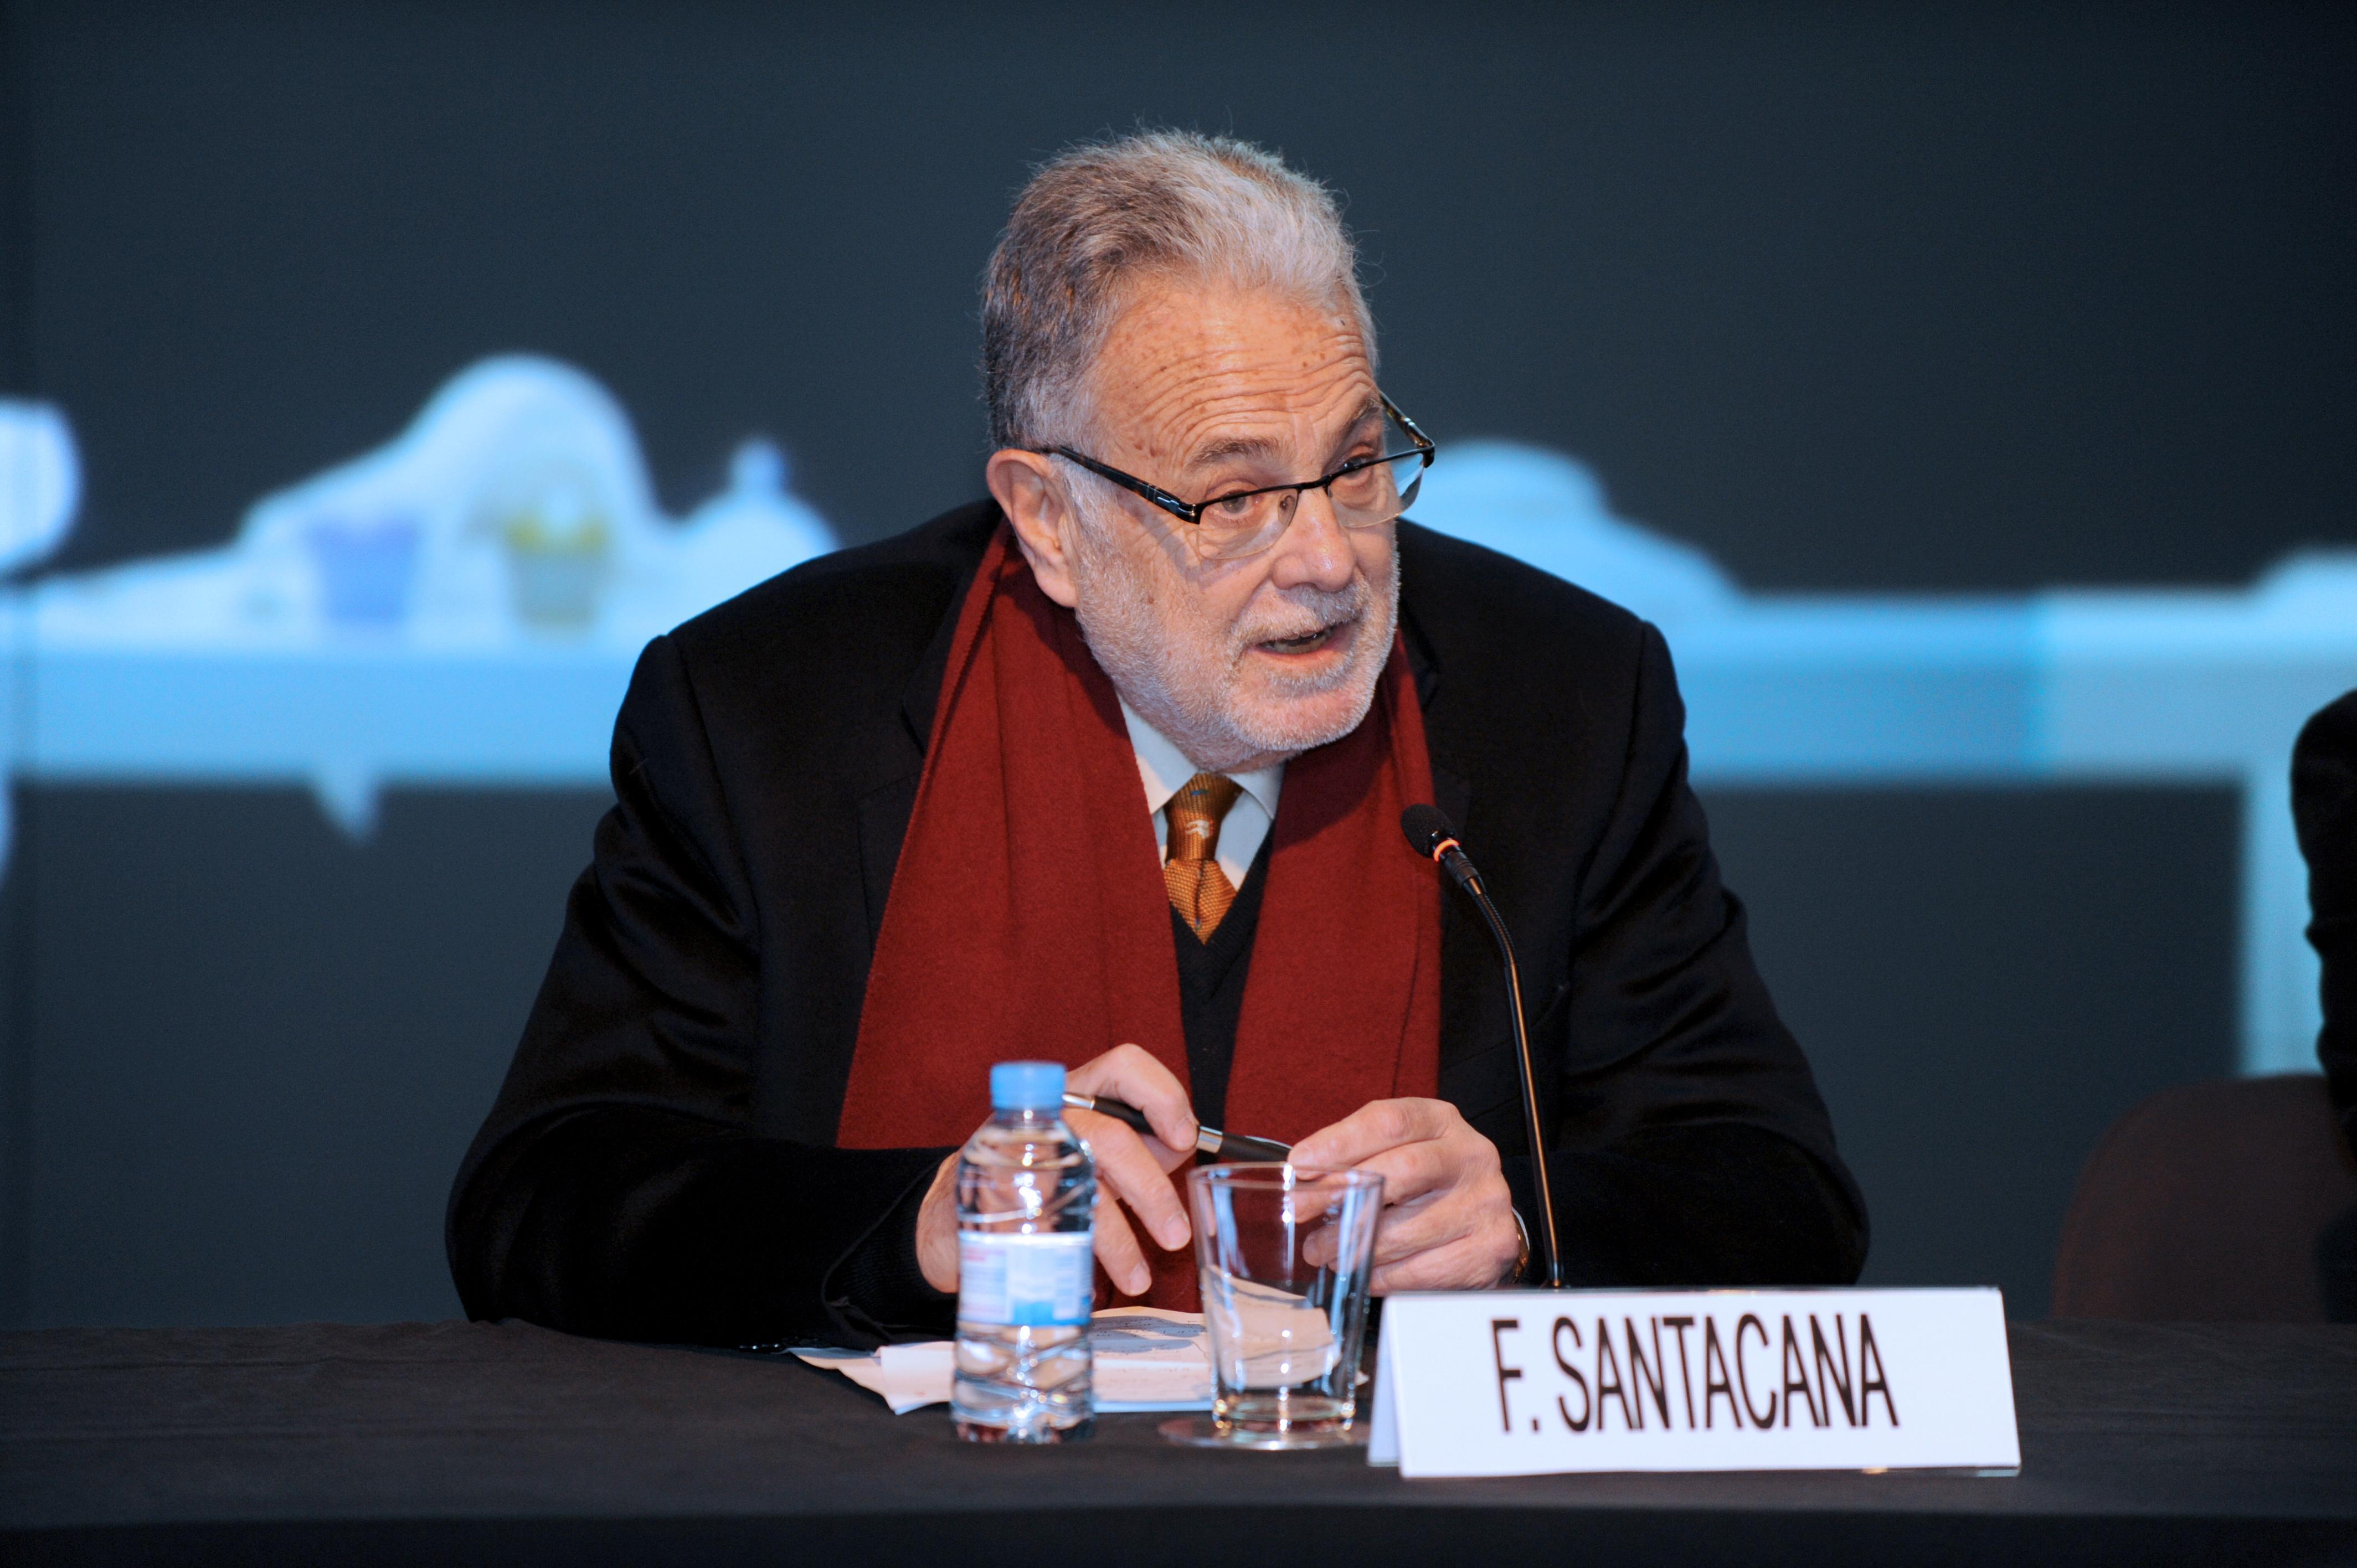 Francesc Santacana